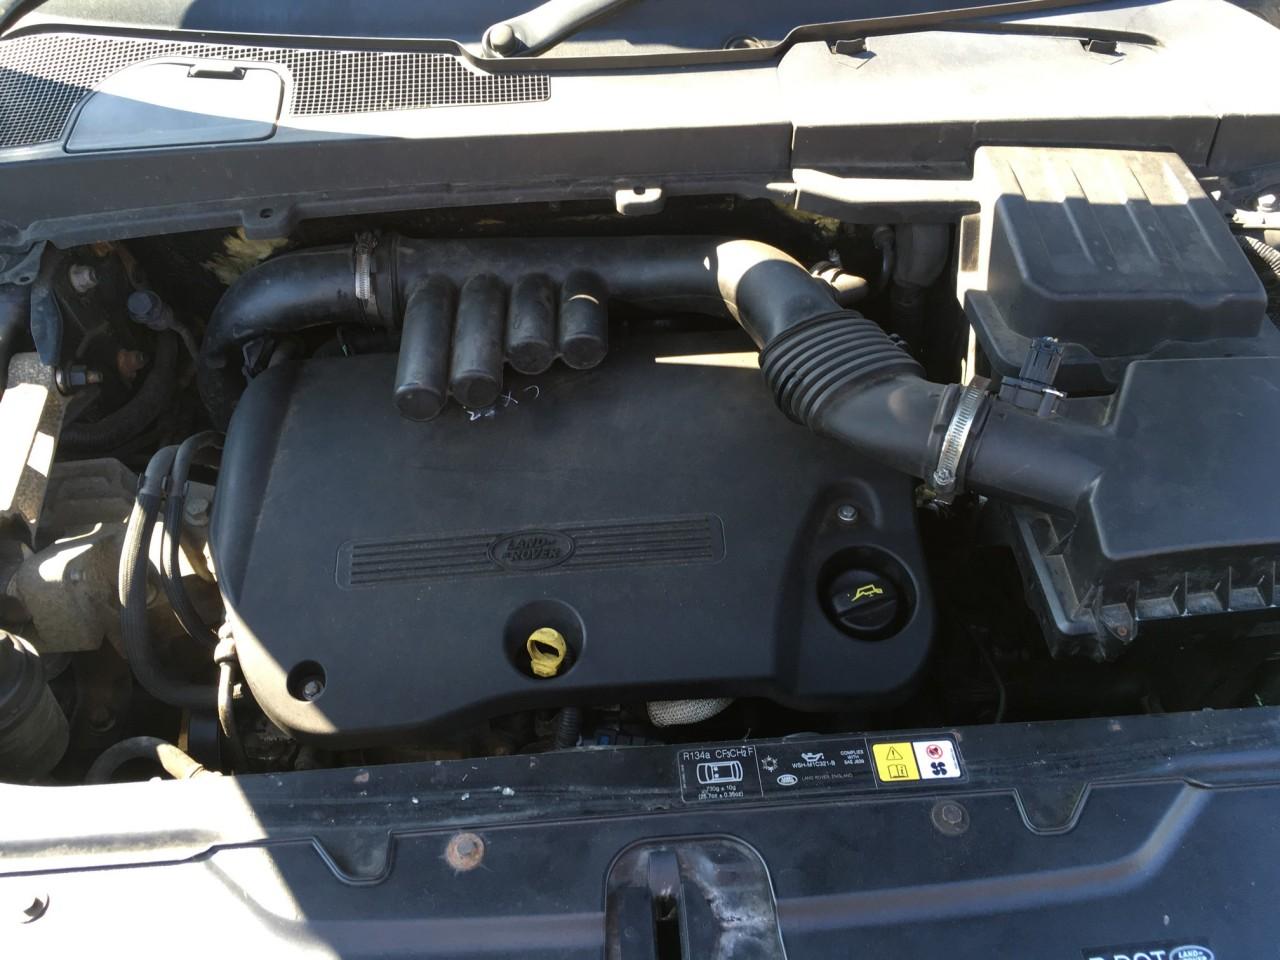 Motor Land Rover Freelander 2.2 Diesel tip motor 224DT